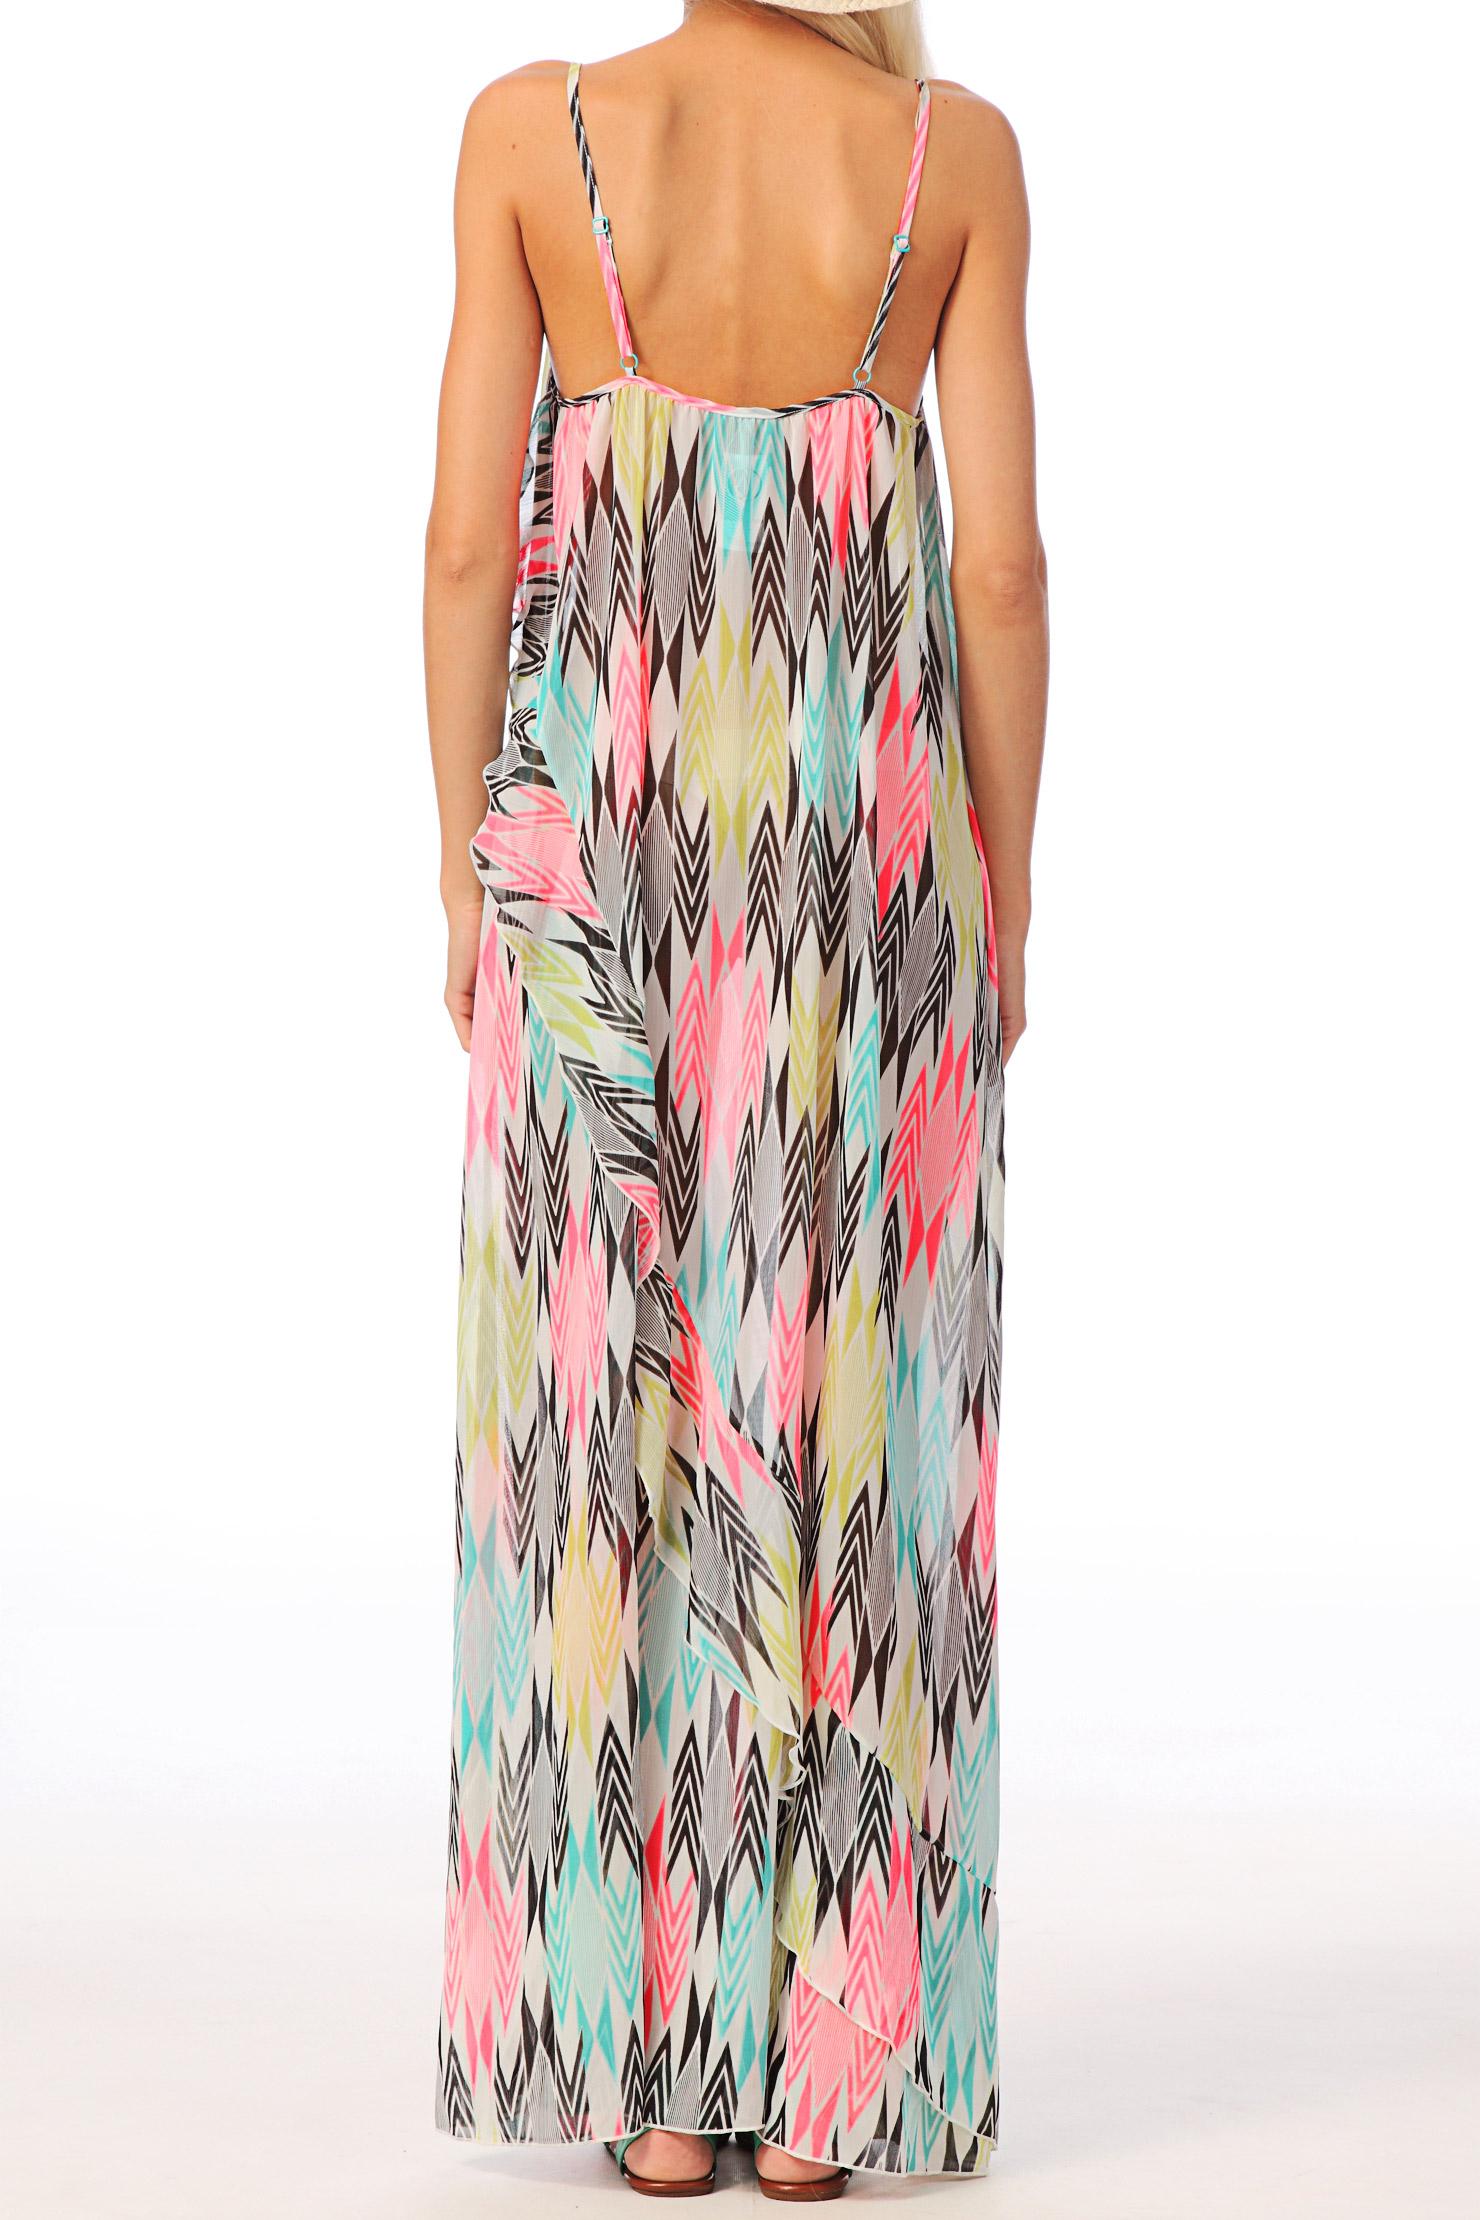 Volcom Maxi Dress